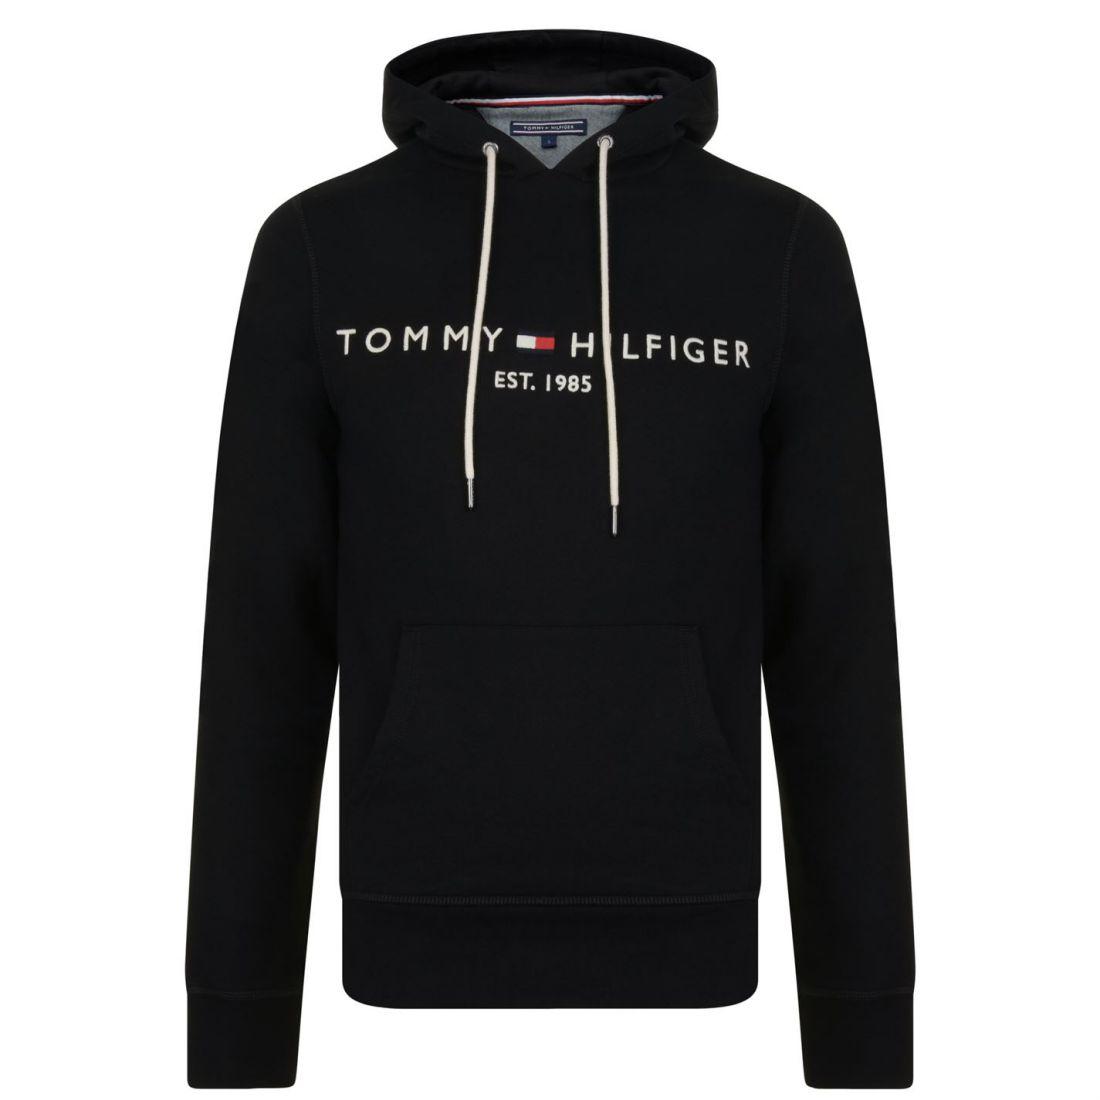 4dbbf16e Image is loading Mens-TOMMY-HILFIGER-Logo-Hooded-Sweatshirt-OTH-Hoodie-